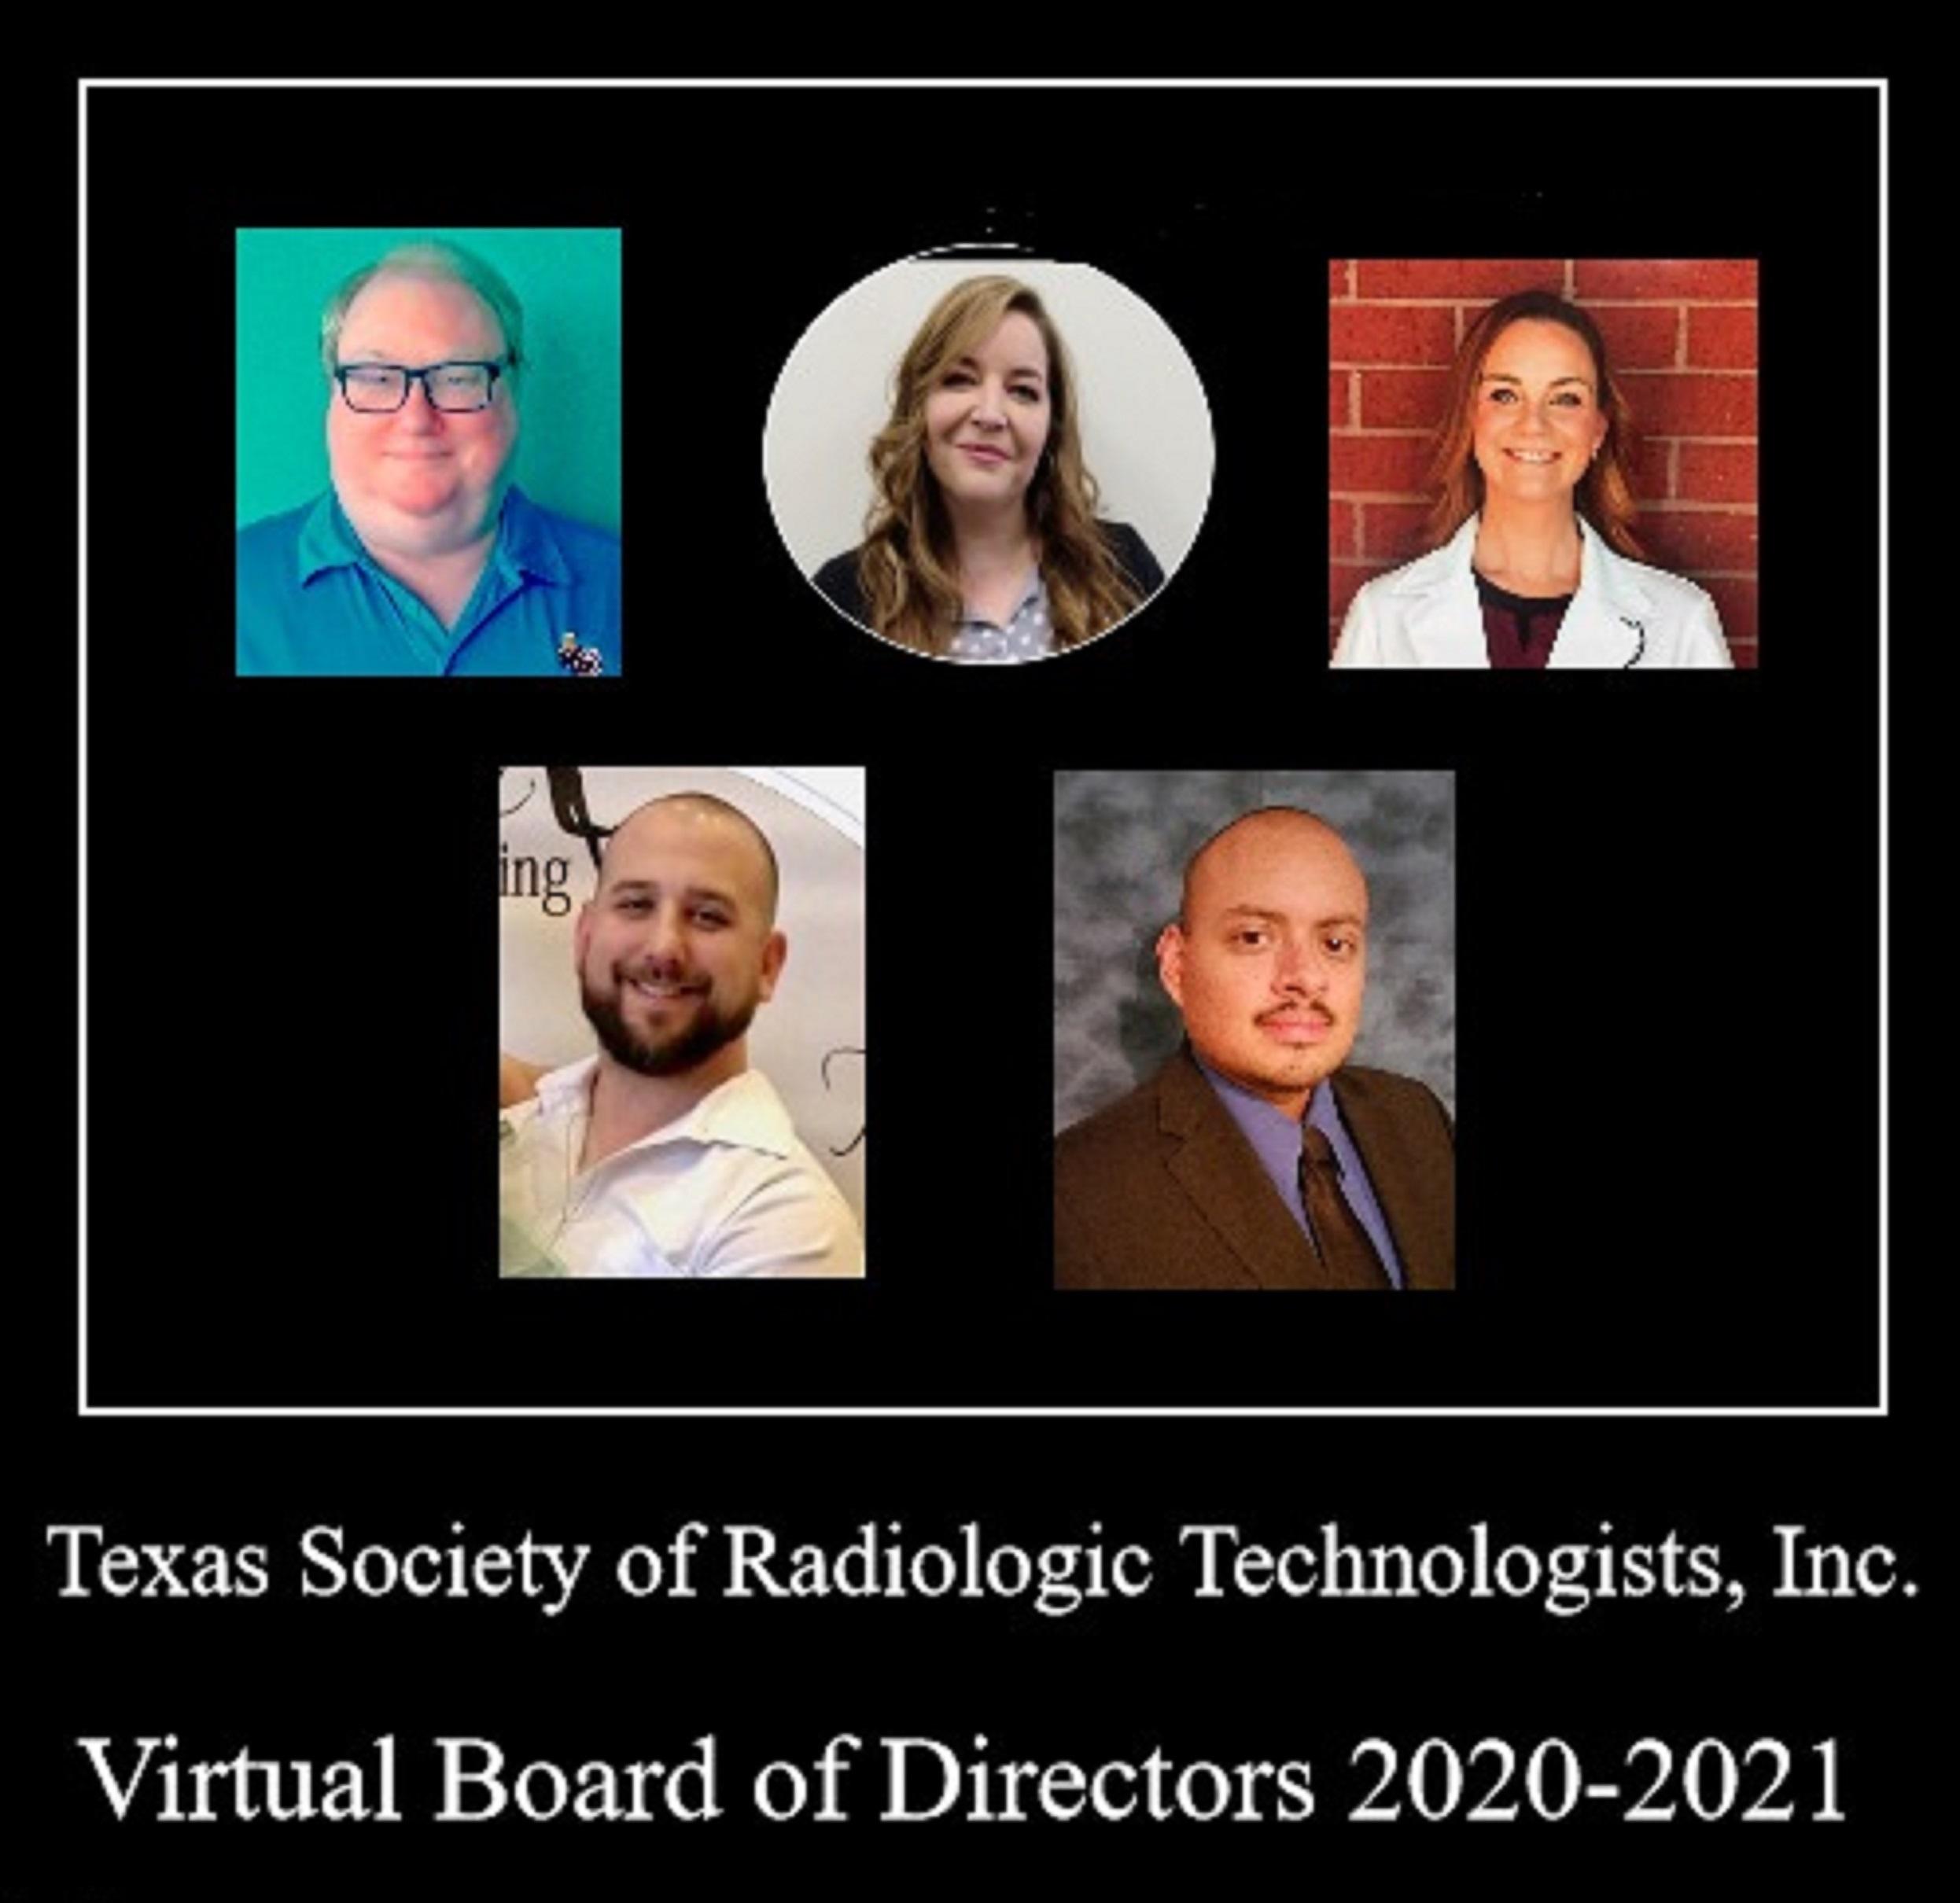 <br><br>TSRT Board of Directors